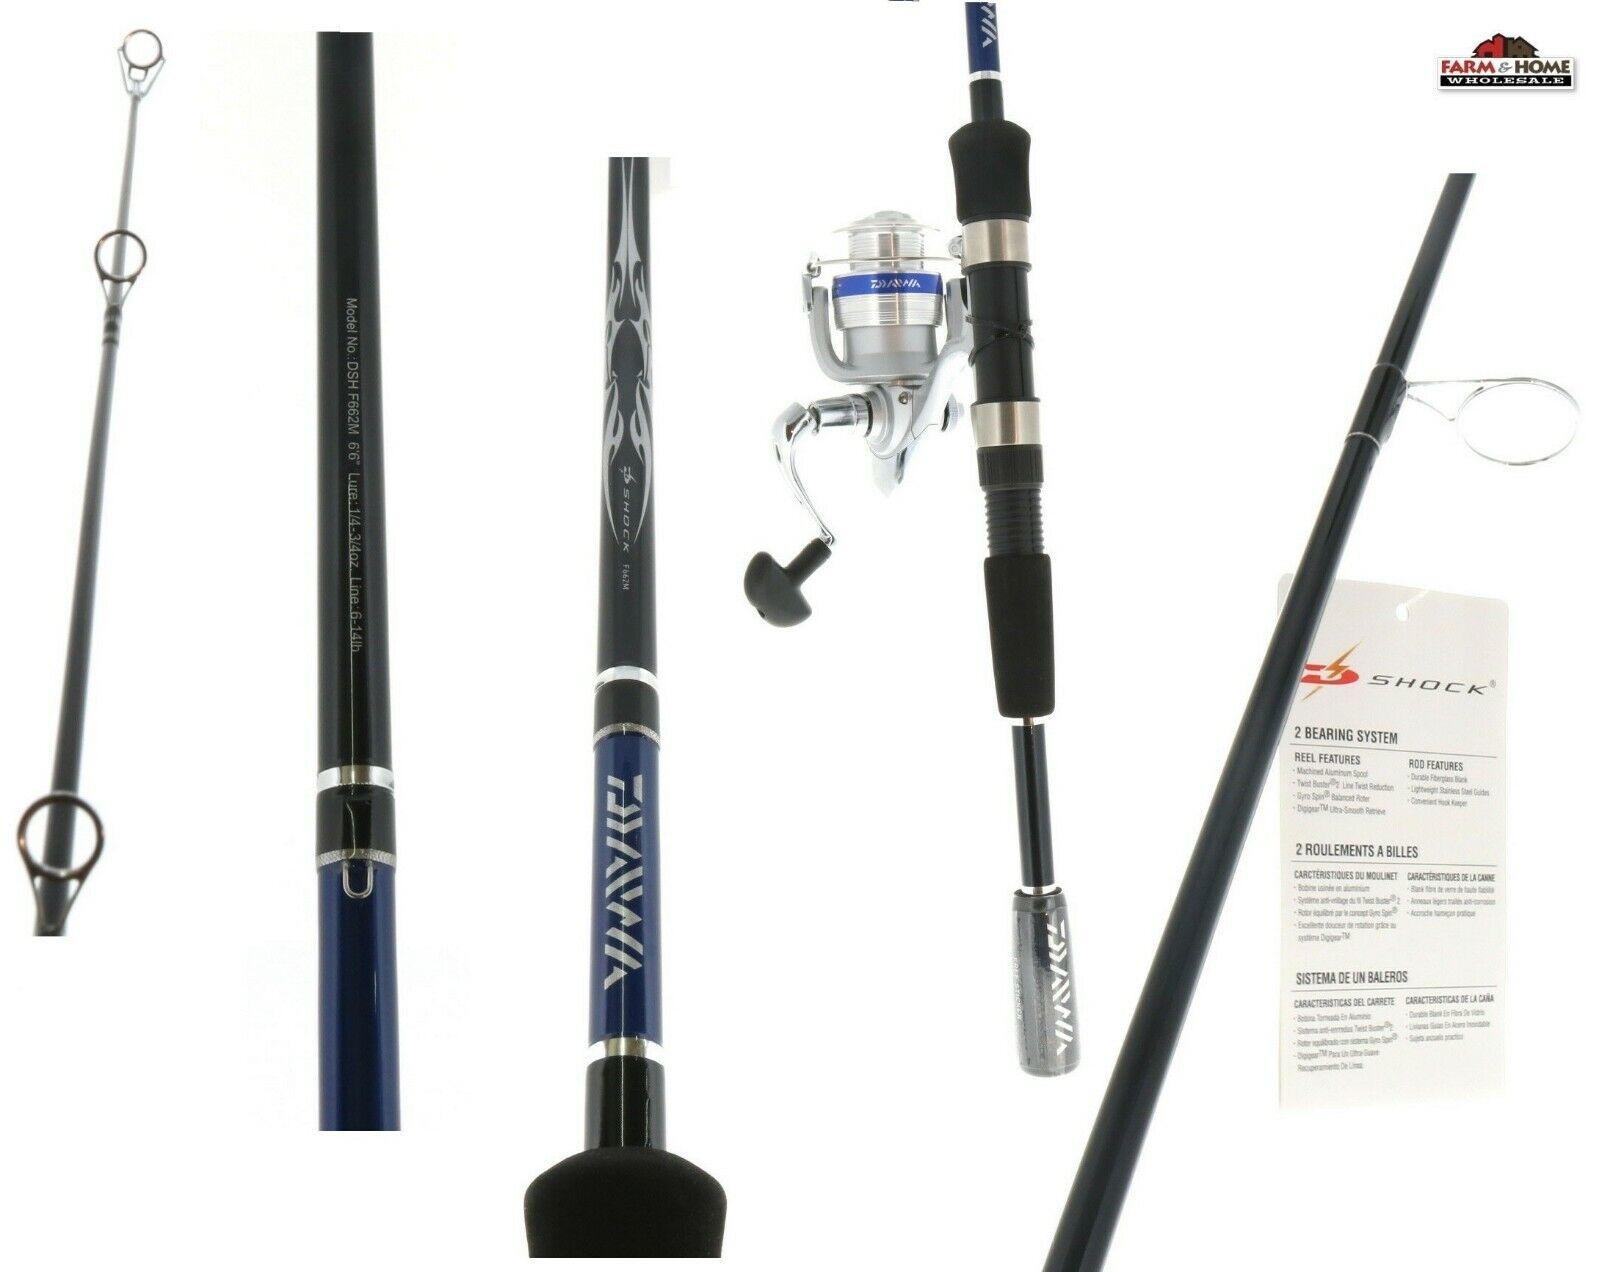 6'6  Daiwa Fishing Pole Spinning  Rod Reel Combo  DSH25-2B F662M   New  more discount